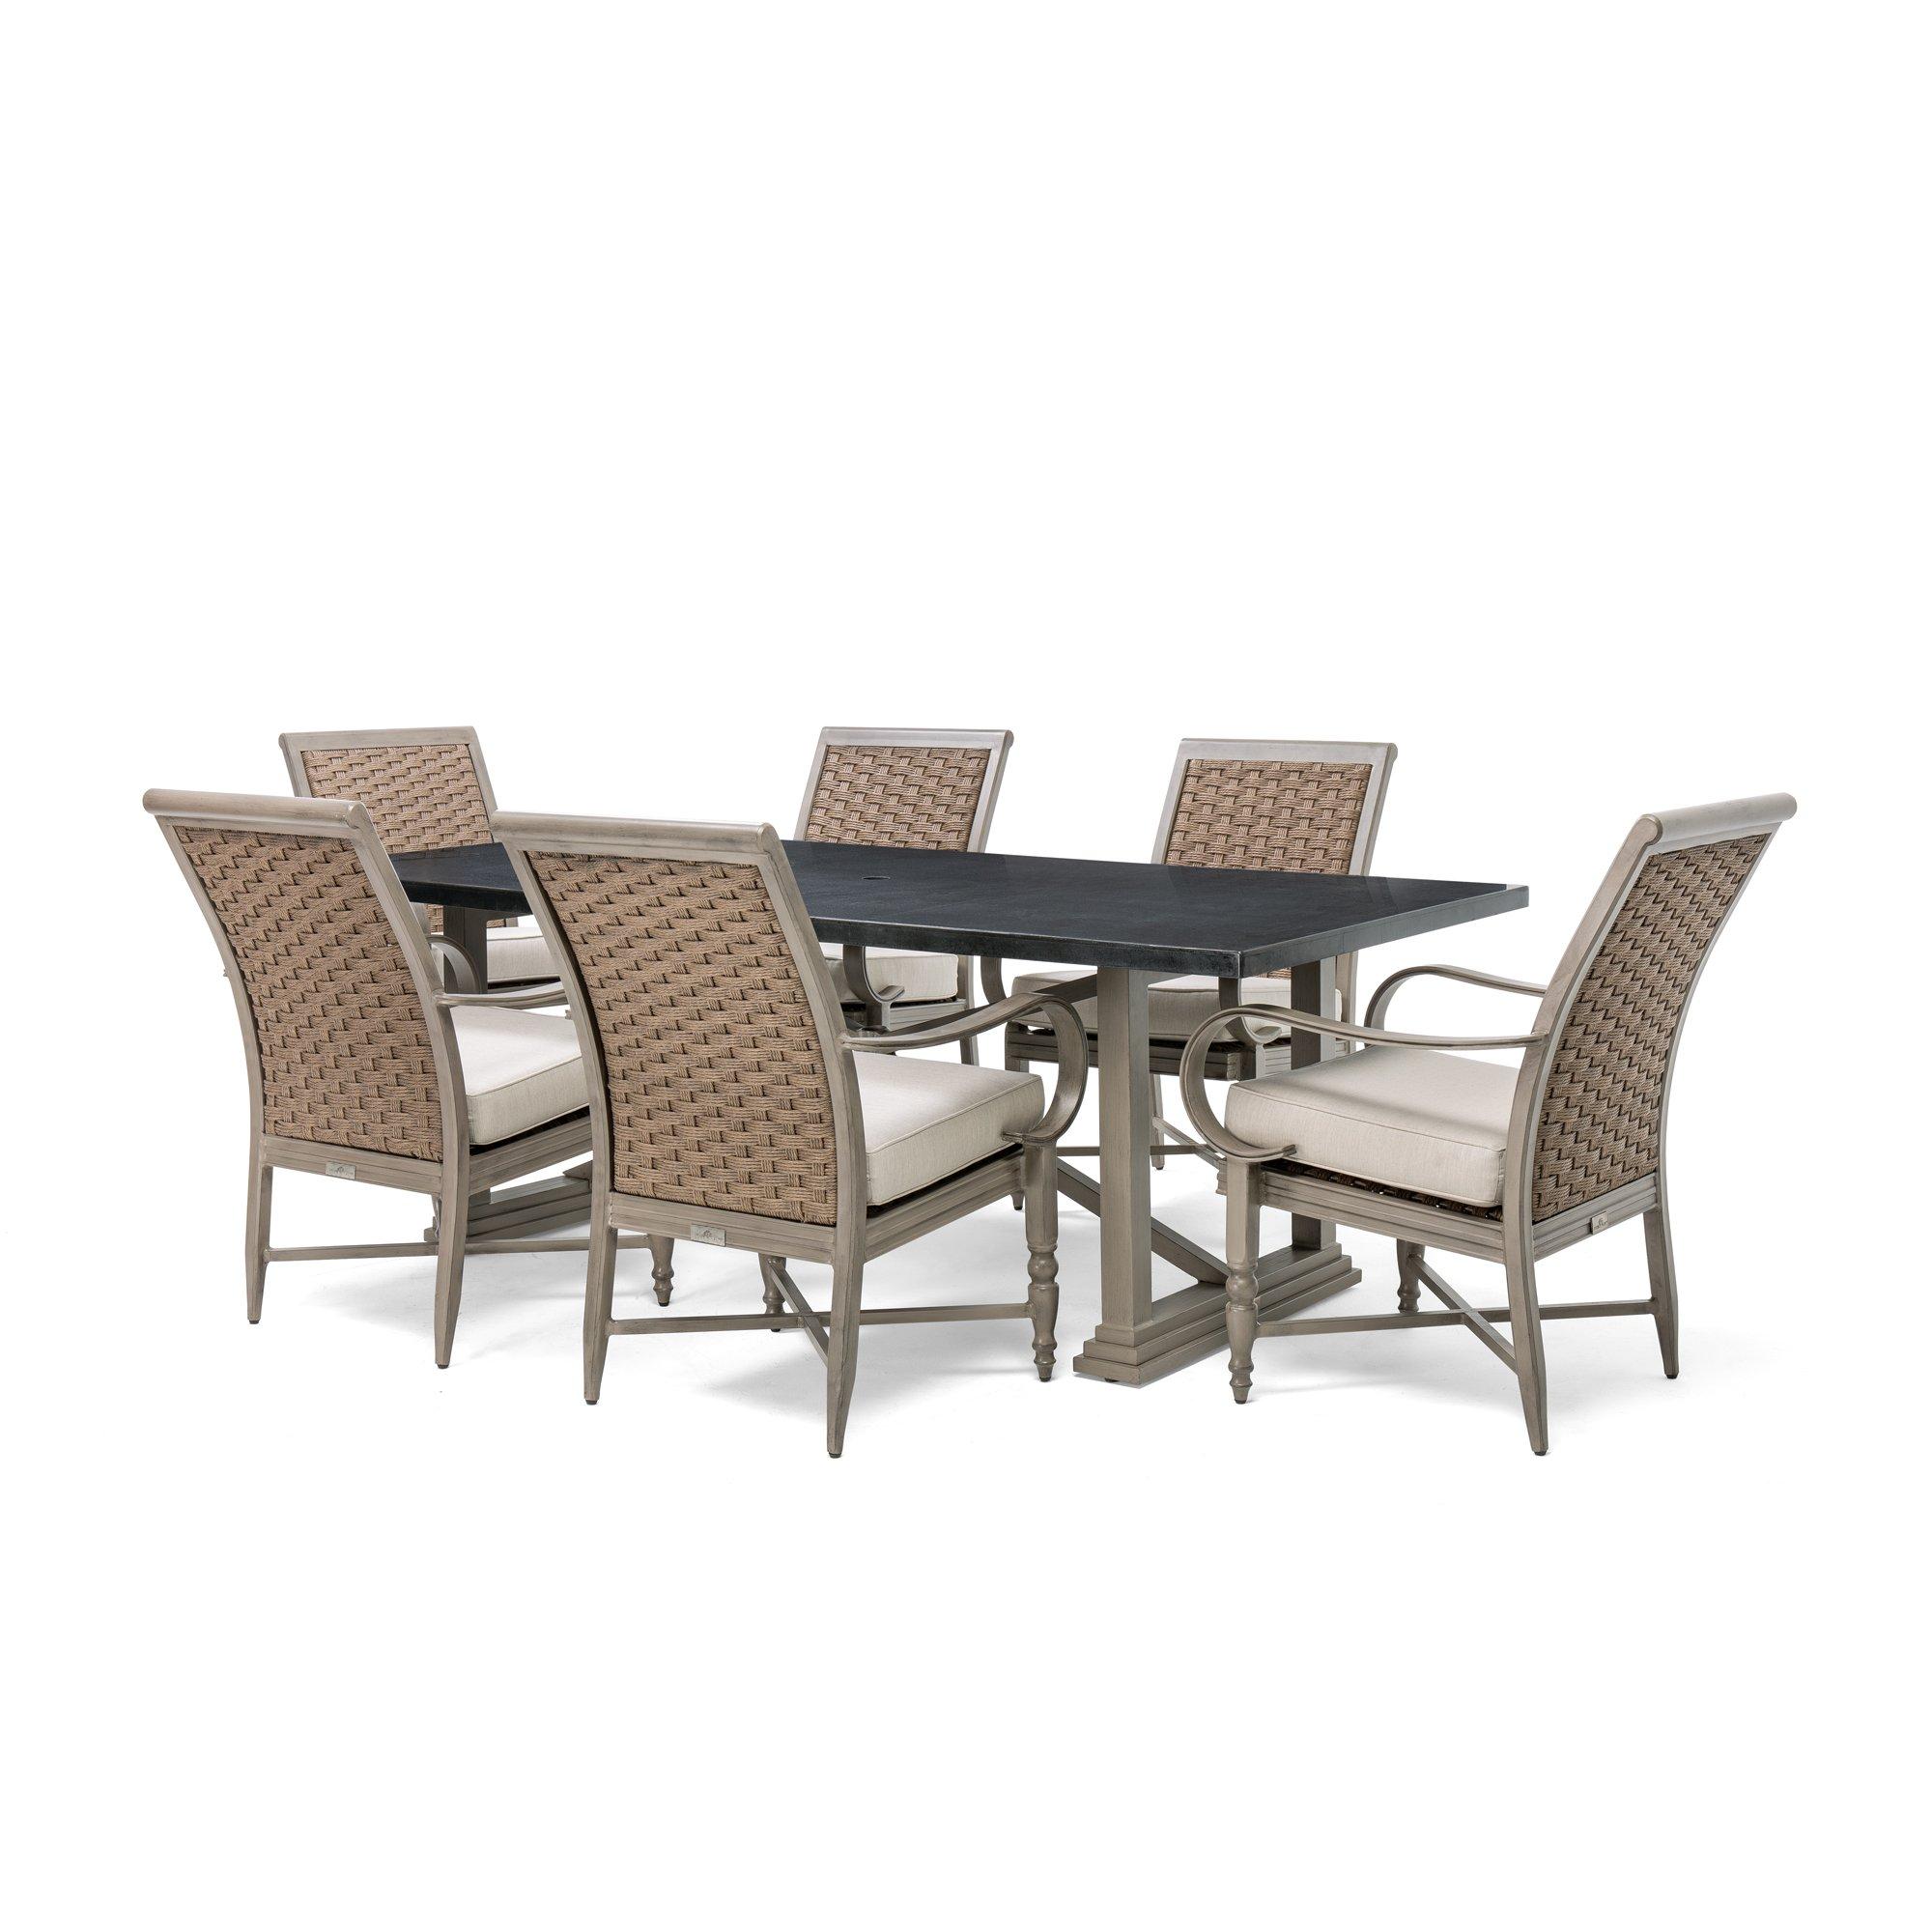 Blue Oak Outdoor Saylor Patio Furniture 7 Piece Dining Set (Rectangular Aluminum Top Dining Table, 6 Stationary Dining Chairs)